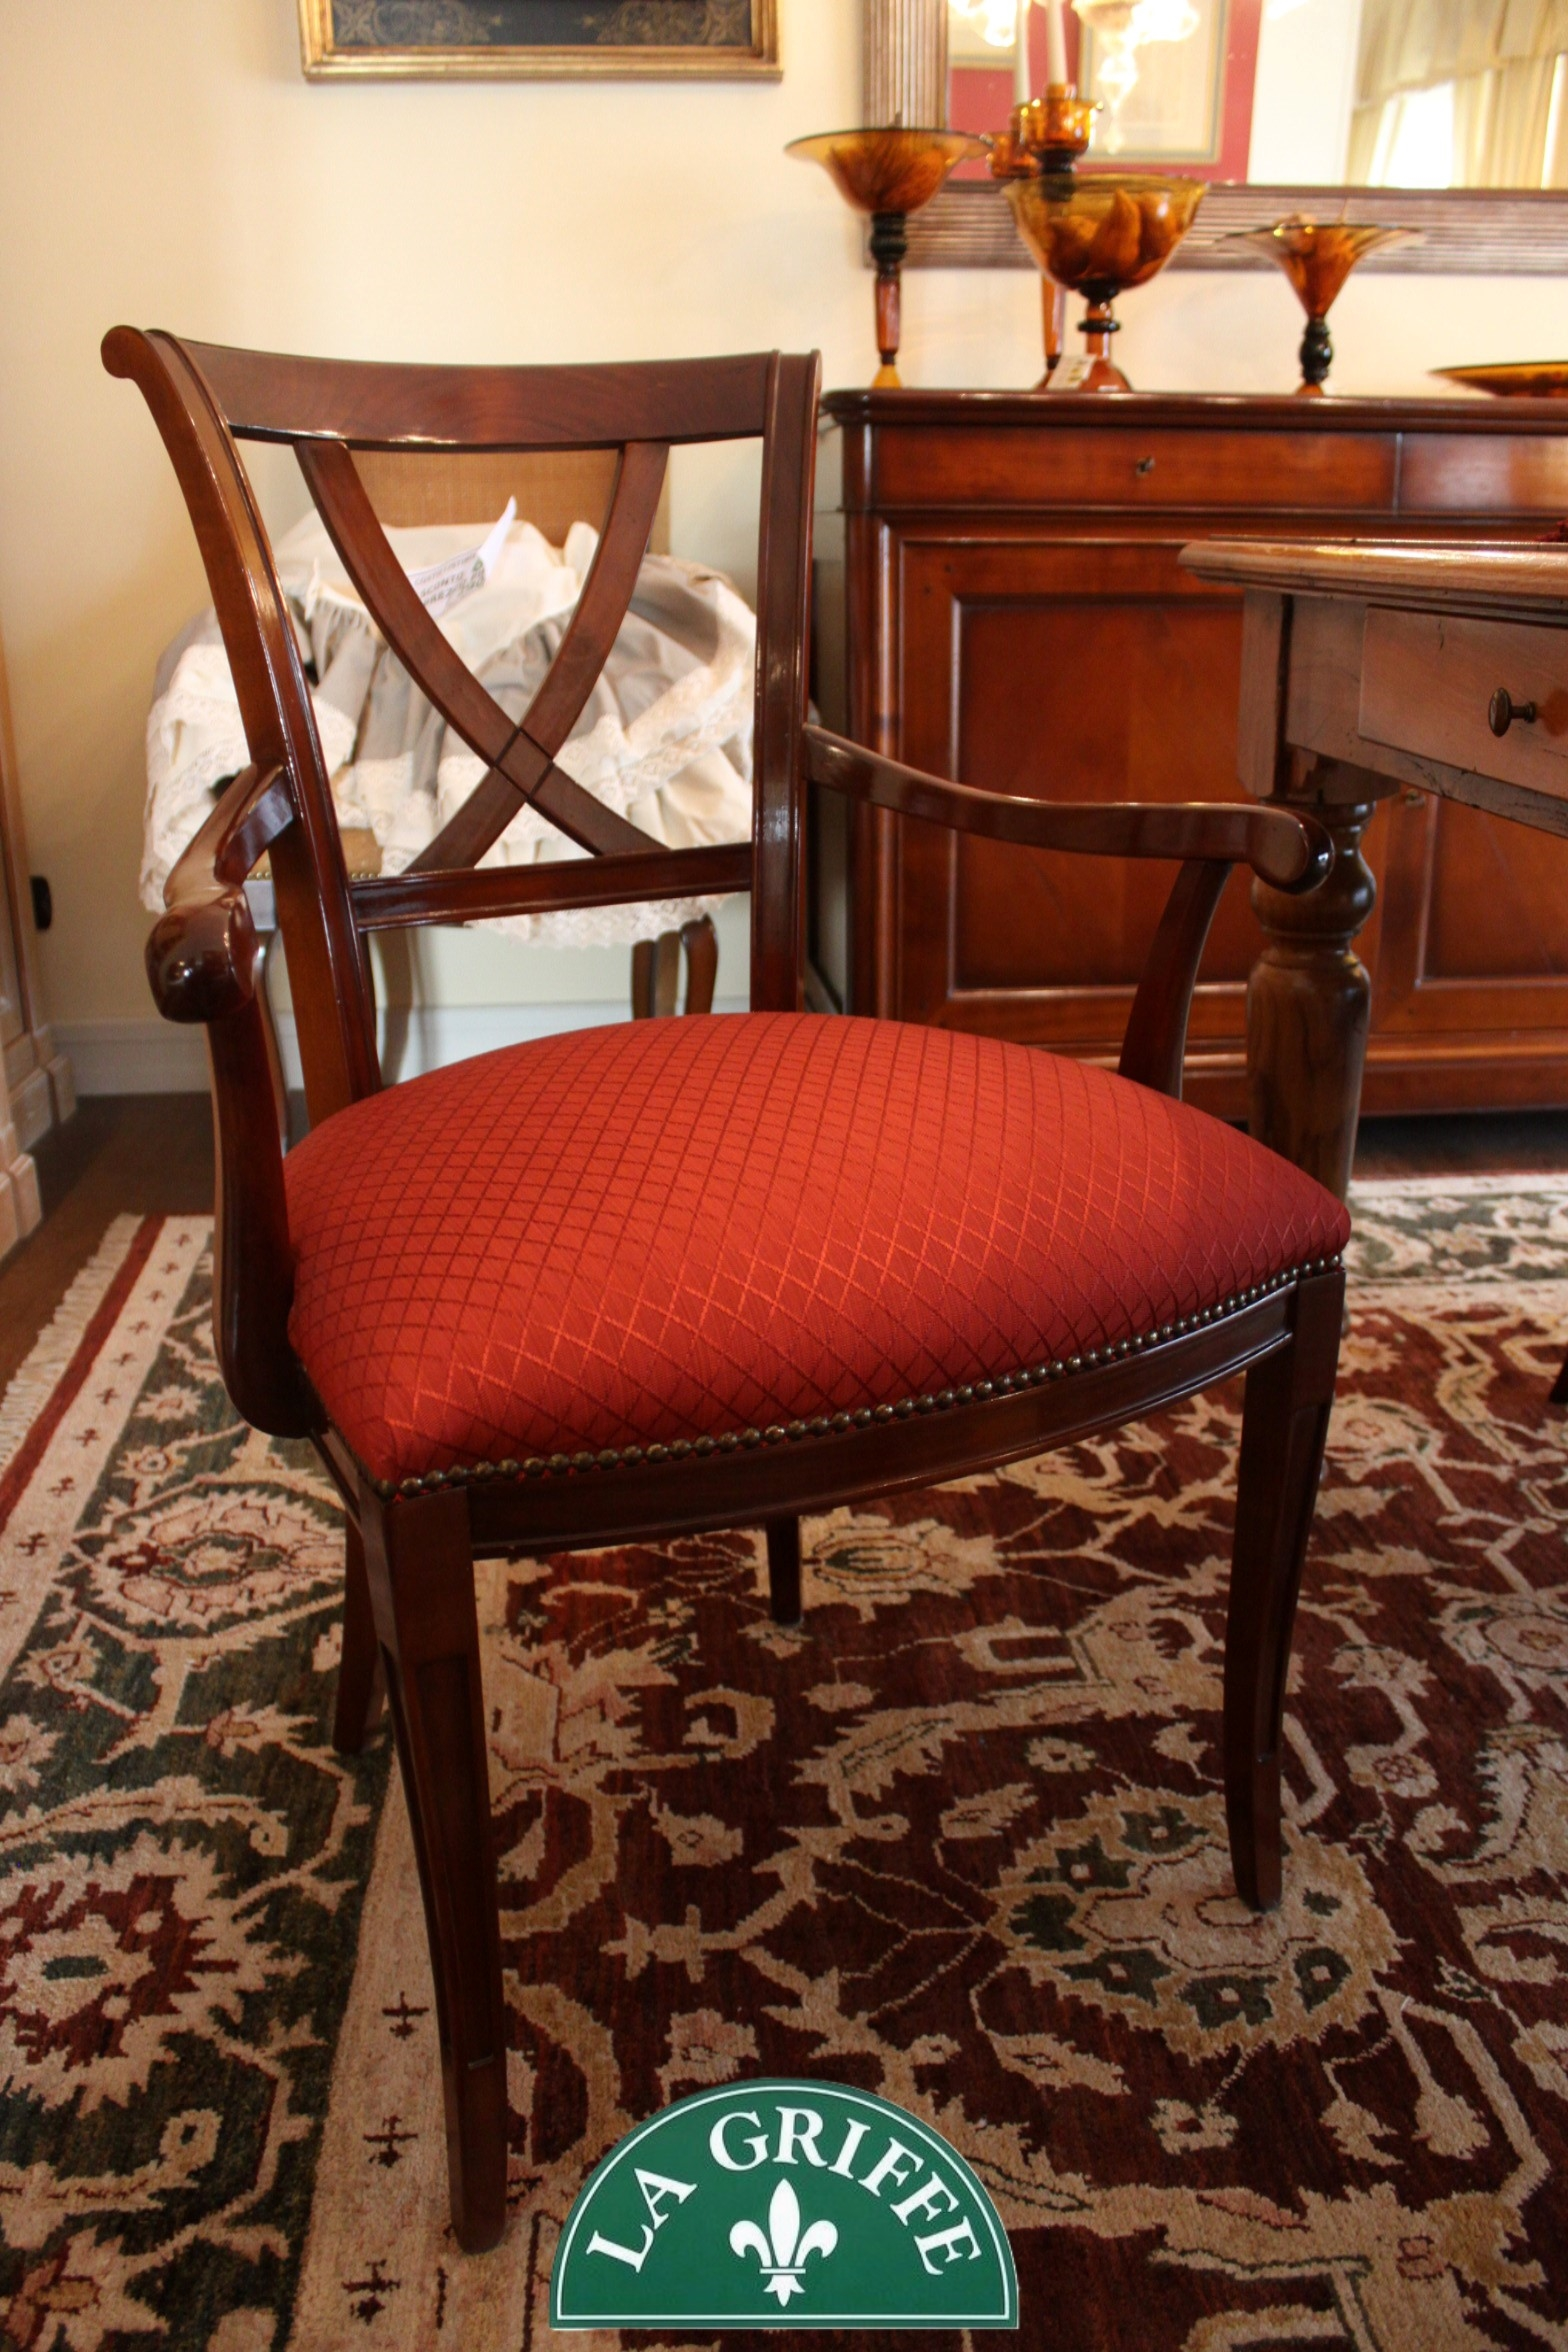 Set 6 sedie 2 poltroncine capotavola 4 sedie in ciliegio - Sedie capotavola ...